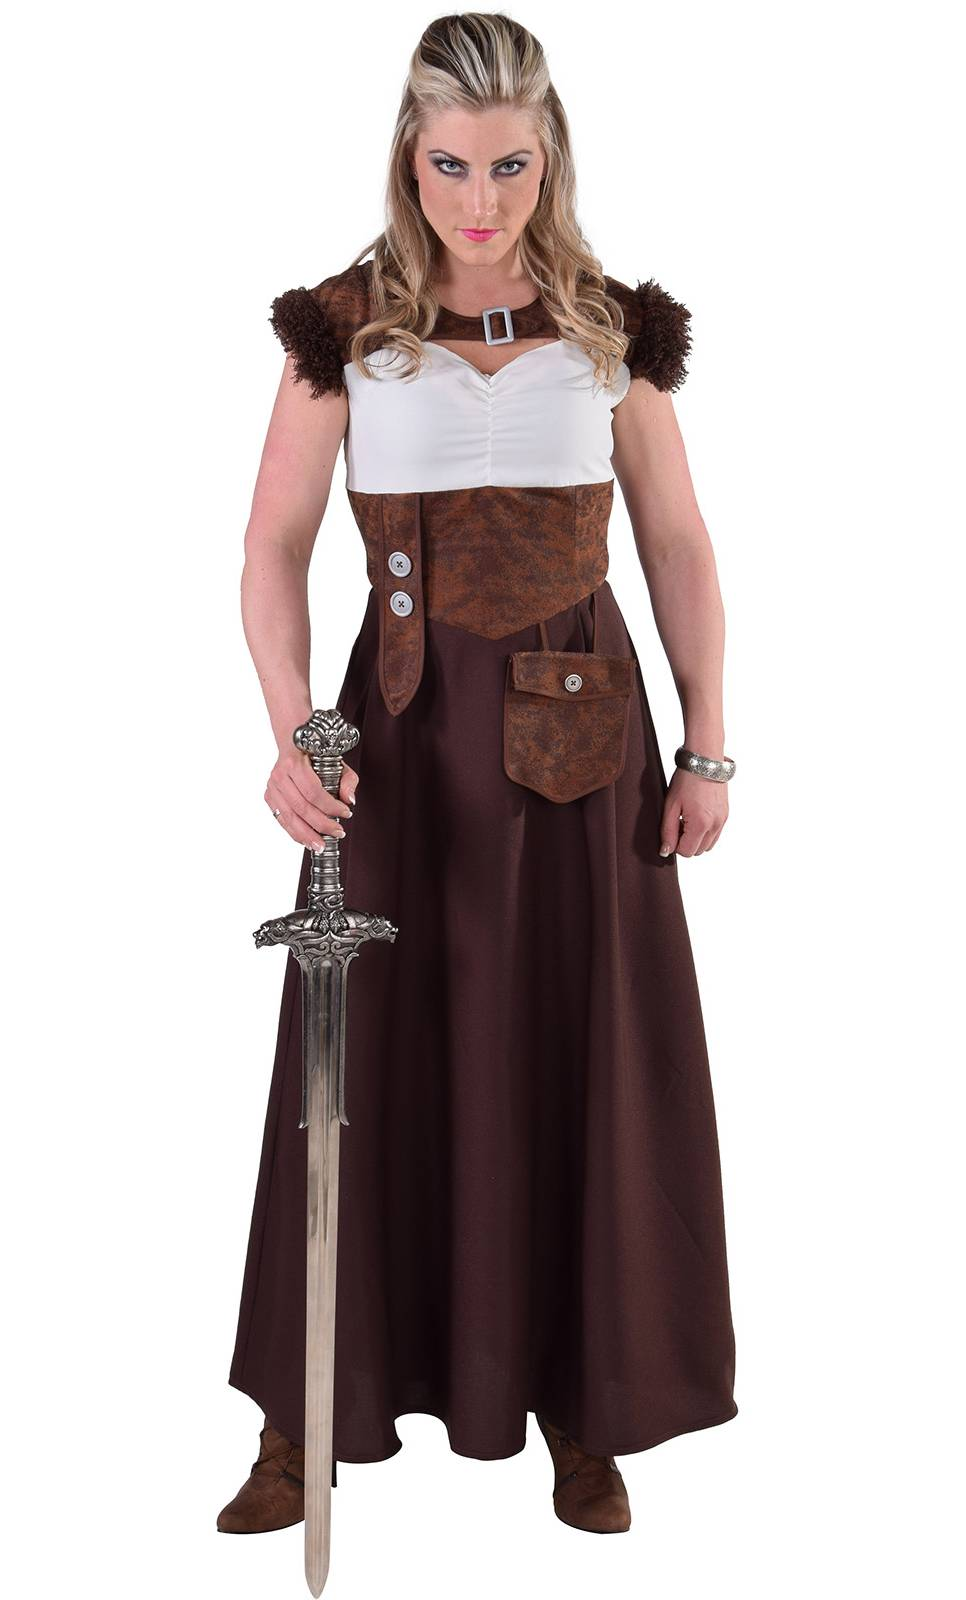 Costume viking femme grande taille xl - xxl